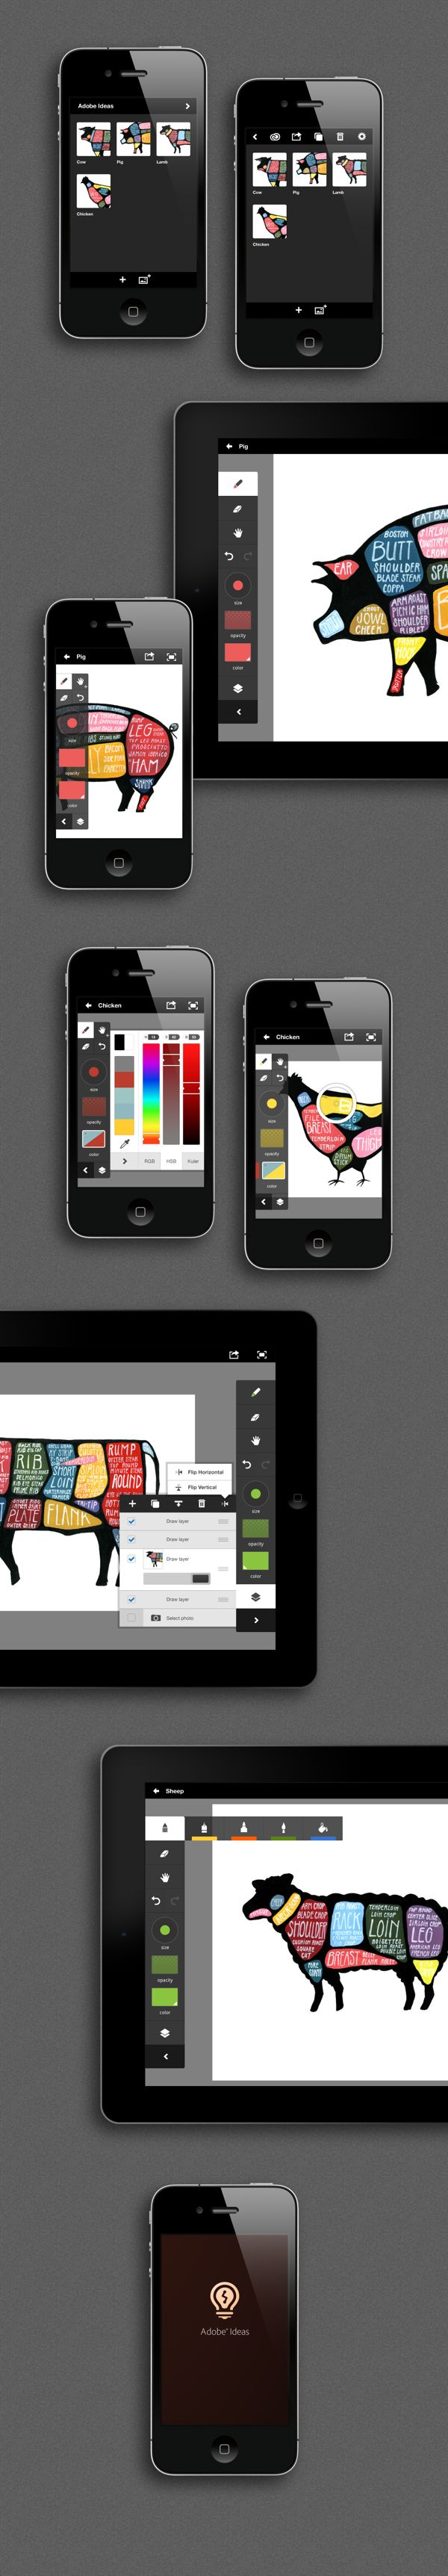 Adobe Ideas by Gabriel Campbell, via Behance